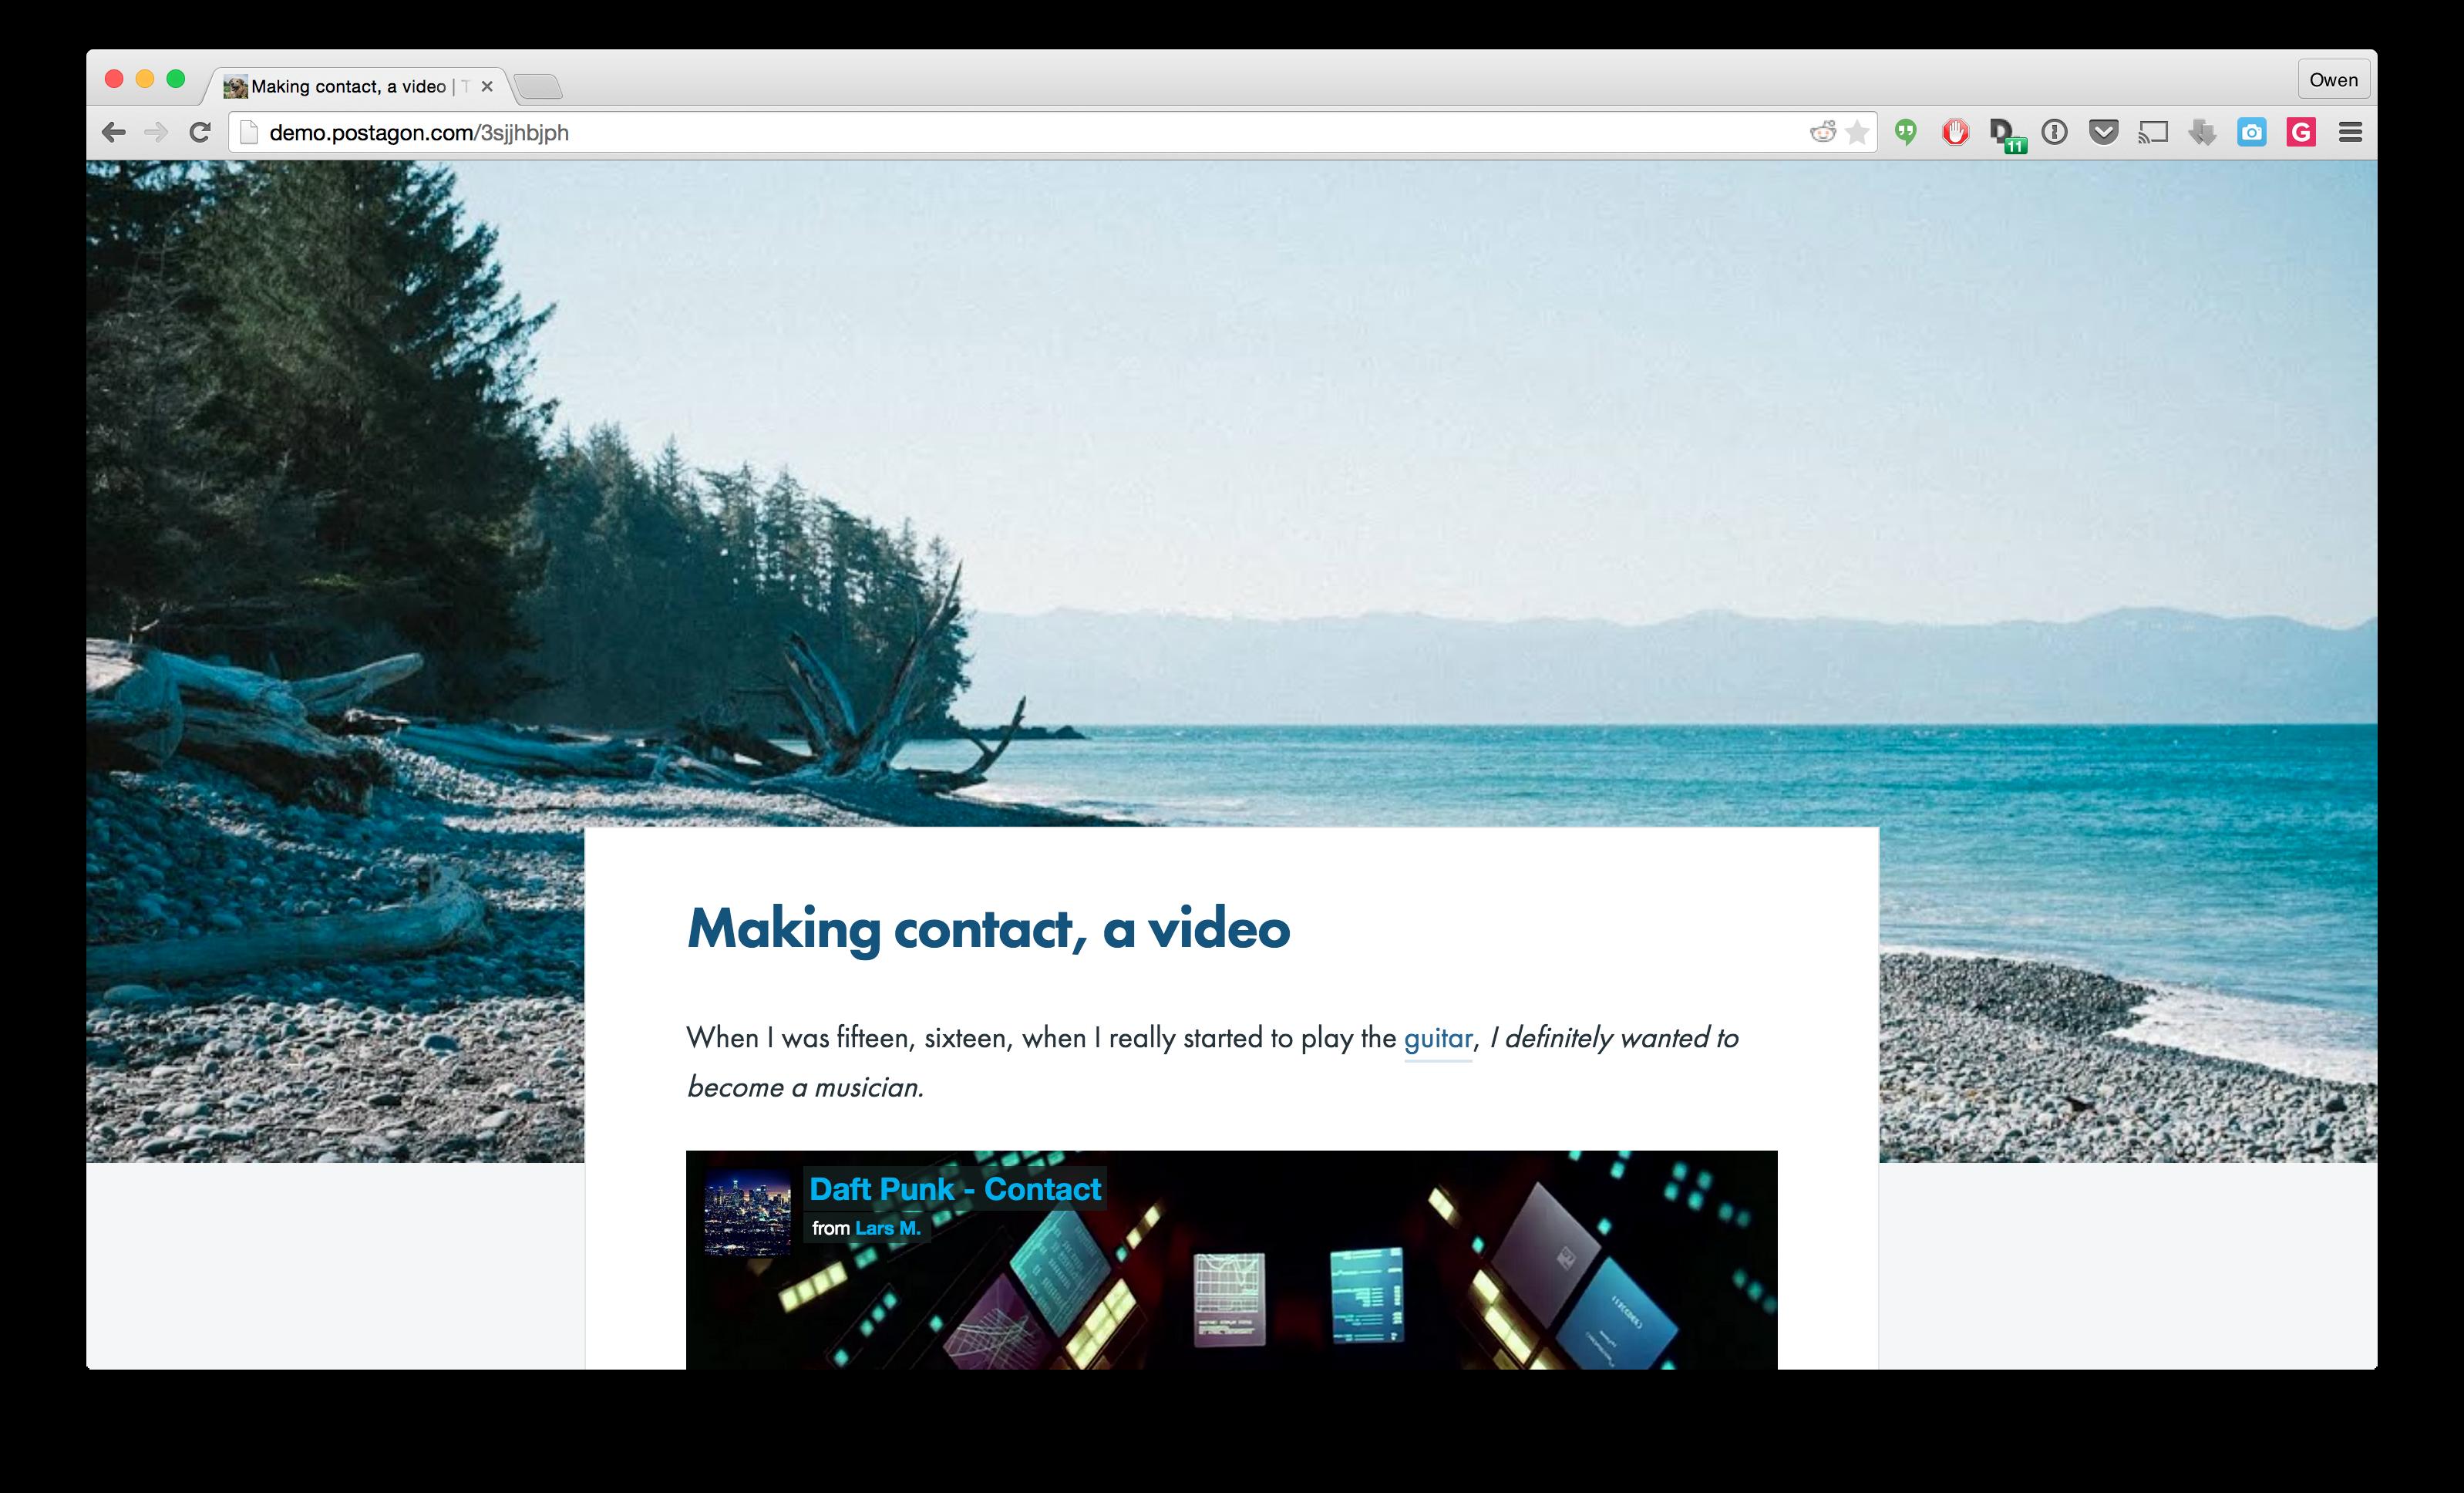 Tumblr Blogs 2015 Screen Shot 2015-05-11 at